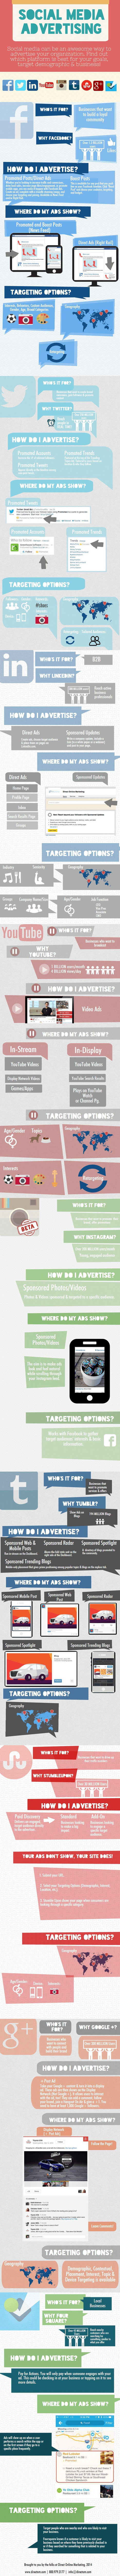 Social Media Advertising: Choosing the Right Platform for Your Business [Infographic] | via #BornToBeSocial, Pinterest Marketing | http://borntobesocial.com